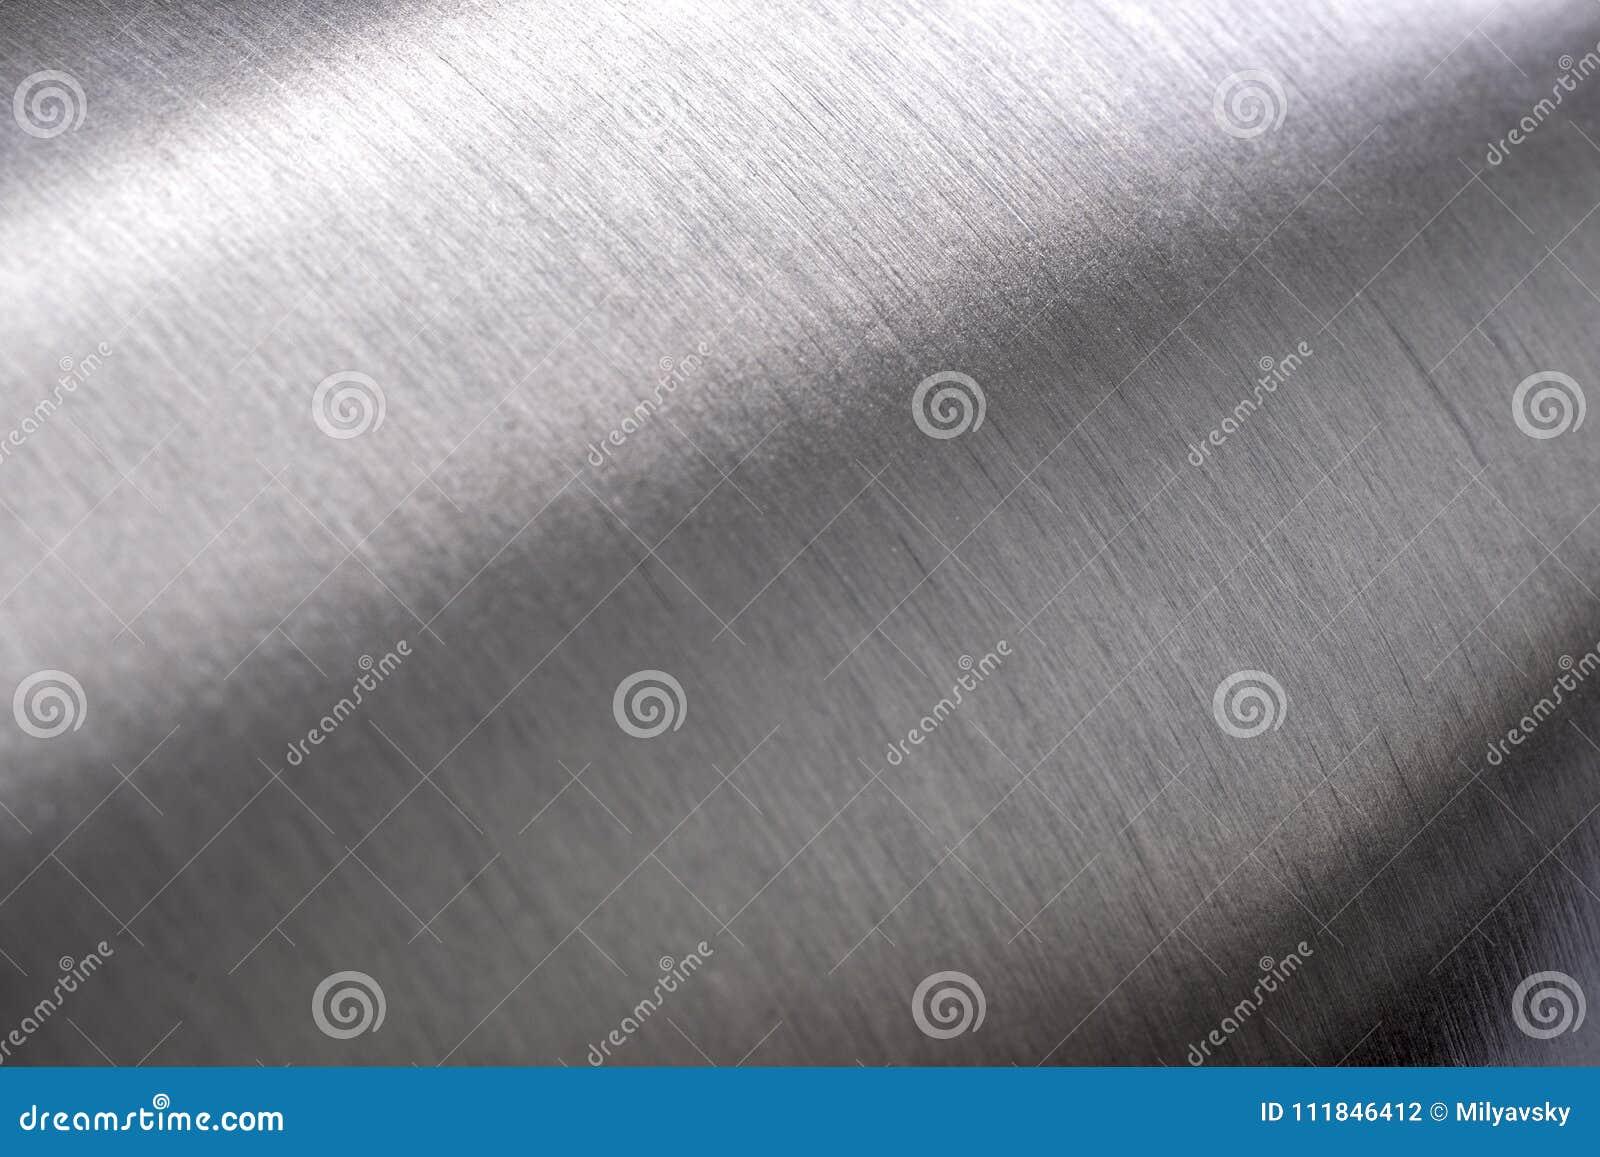 Textura de aço inoxidável, metal arredondado